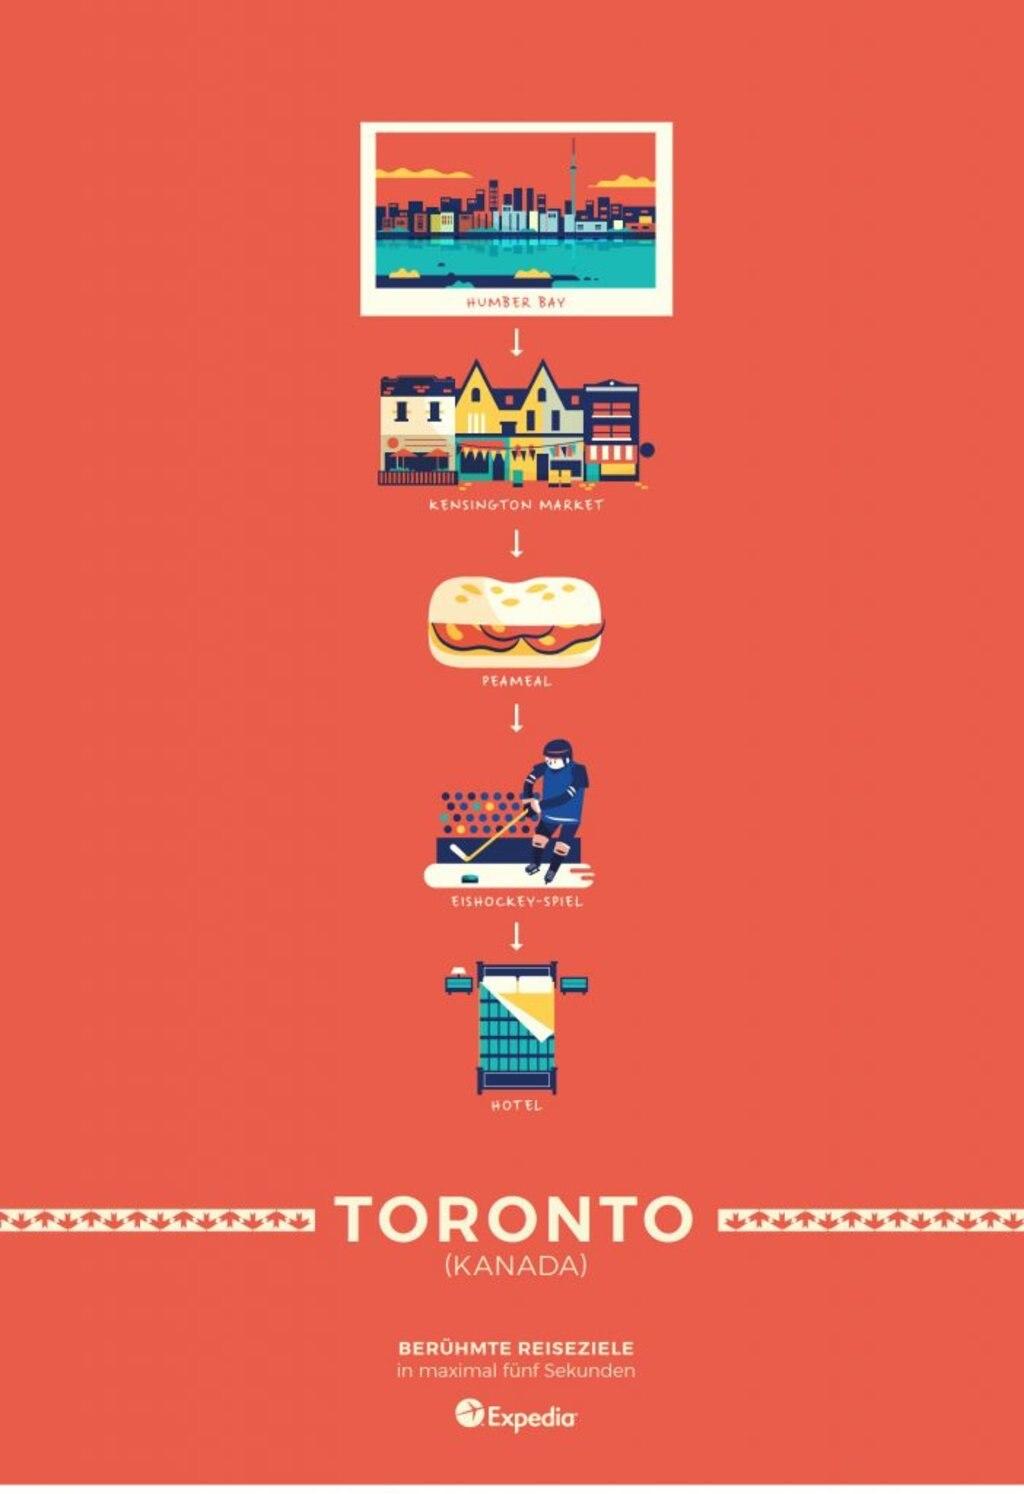 Reiseziele in 5 Sekunden: Toronto